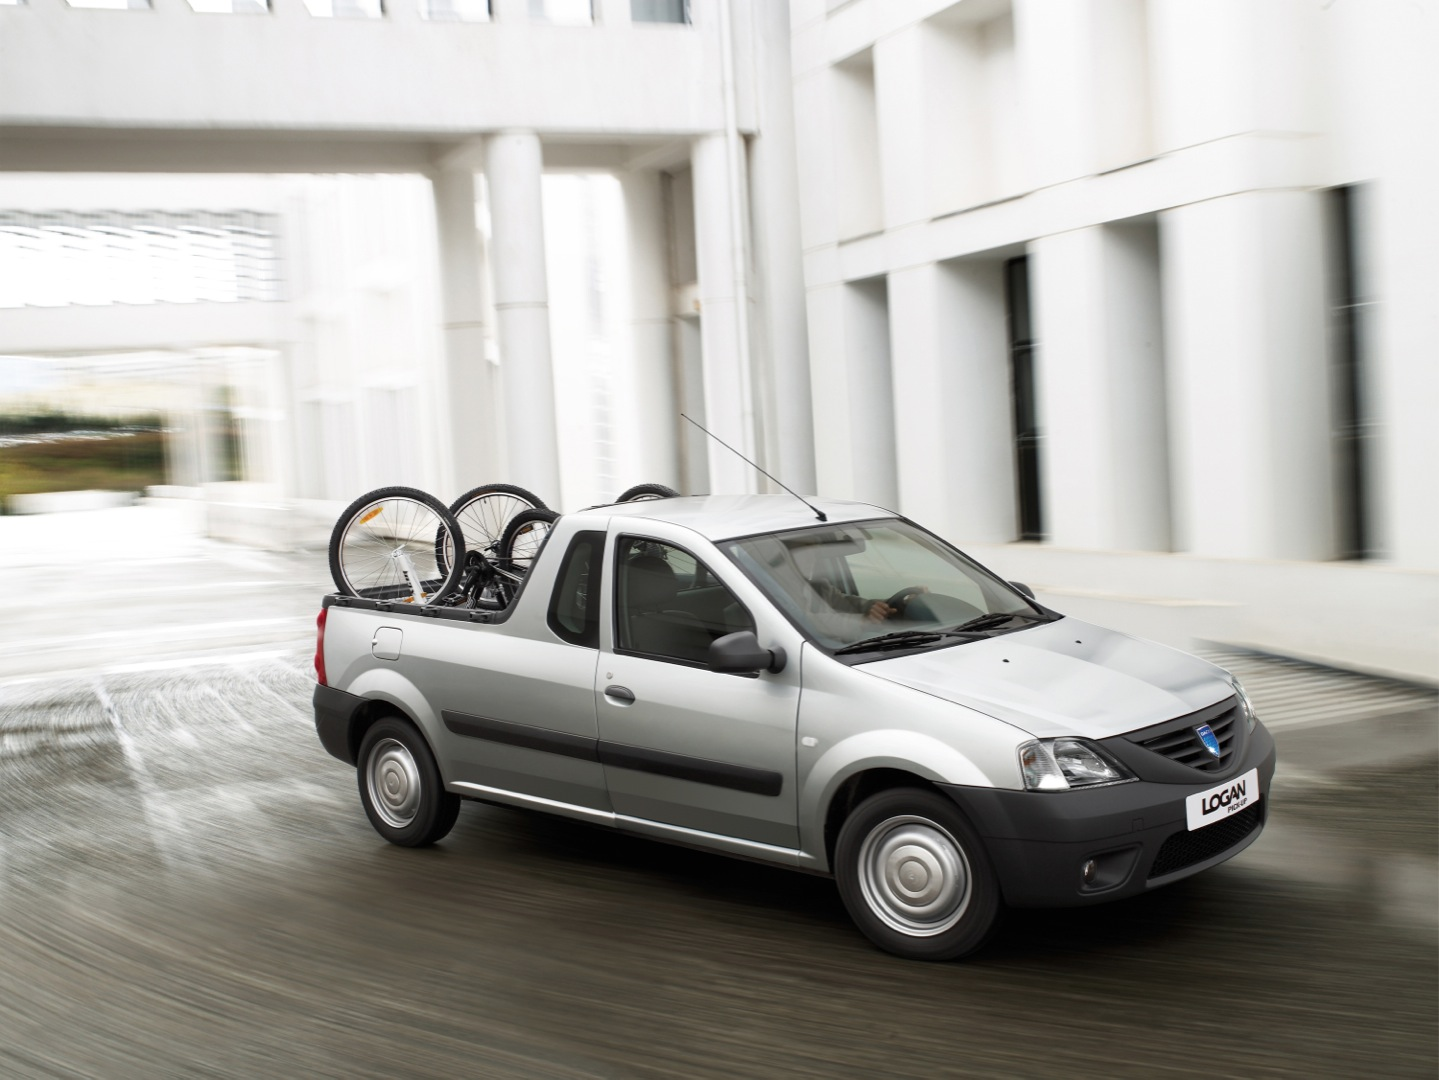 Dacia Logan Pick-up 2007 DACIAPick-up-4554_7